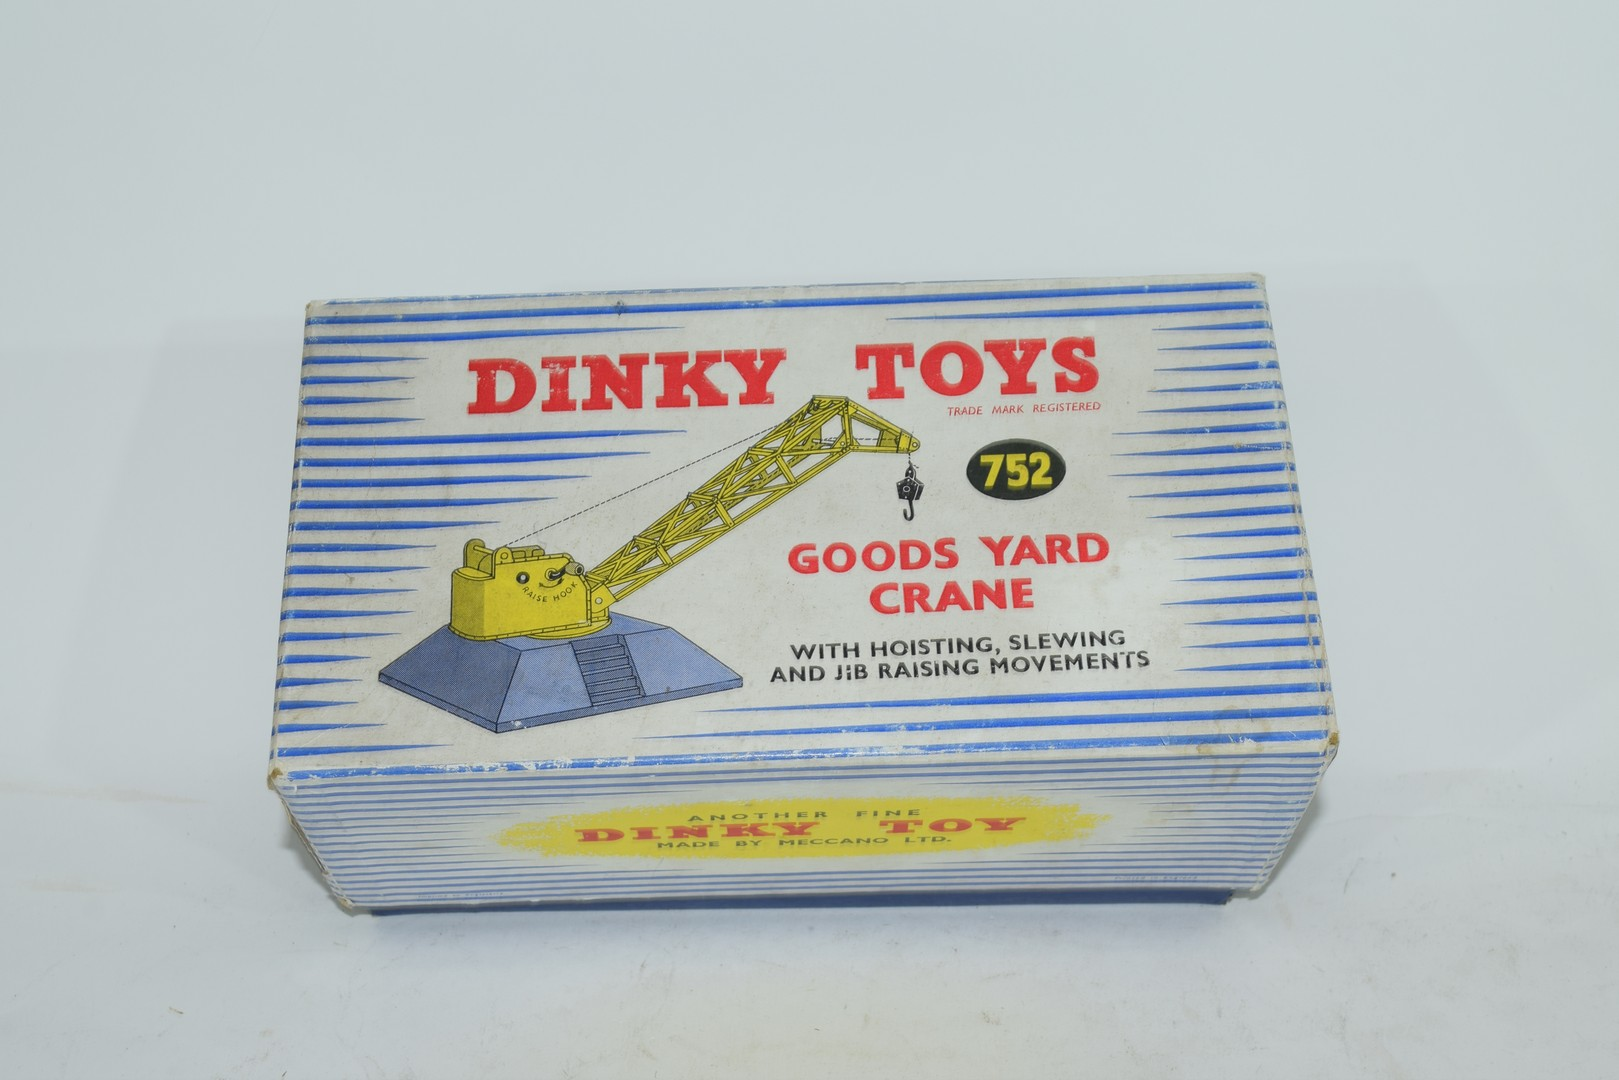 Dinky Goods yard crane No 752 in original box